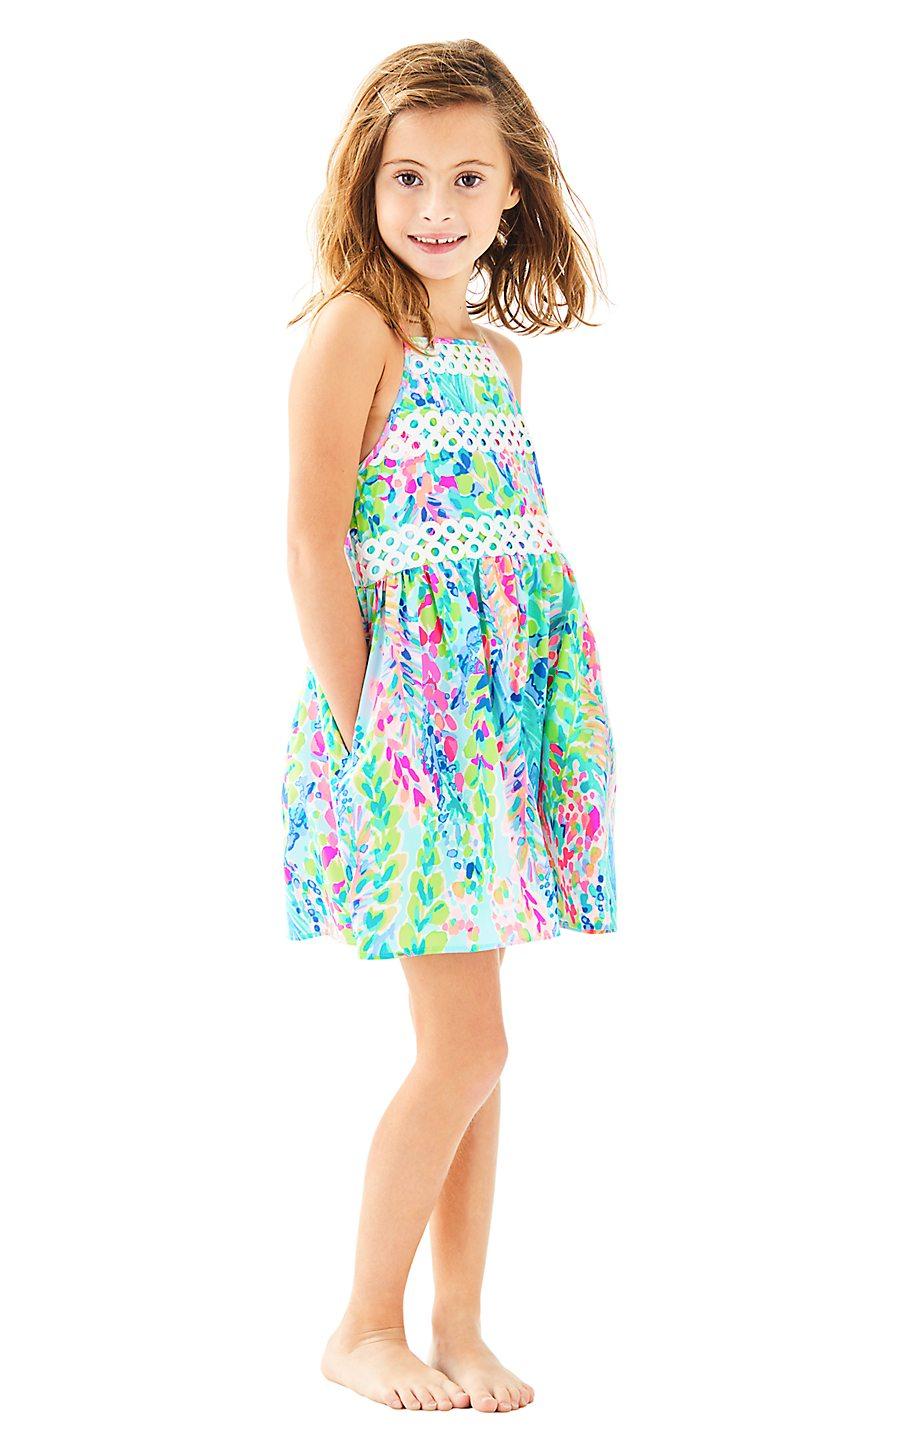 f69269b47 ... Kids » Dresses » ELIZE DRESS – CATCH THE WAVE. 28747_multicatchthewave